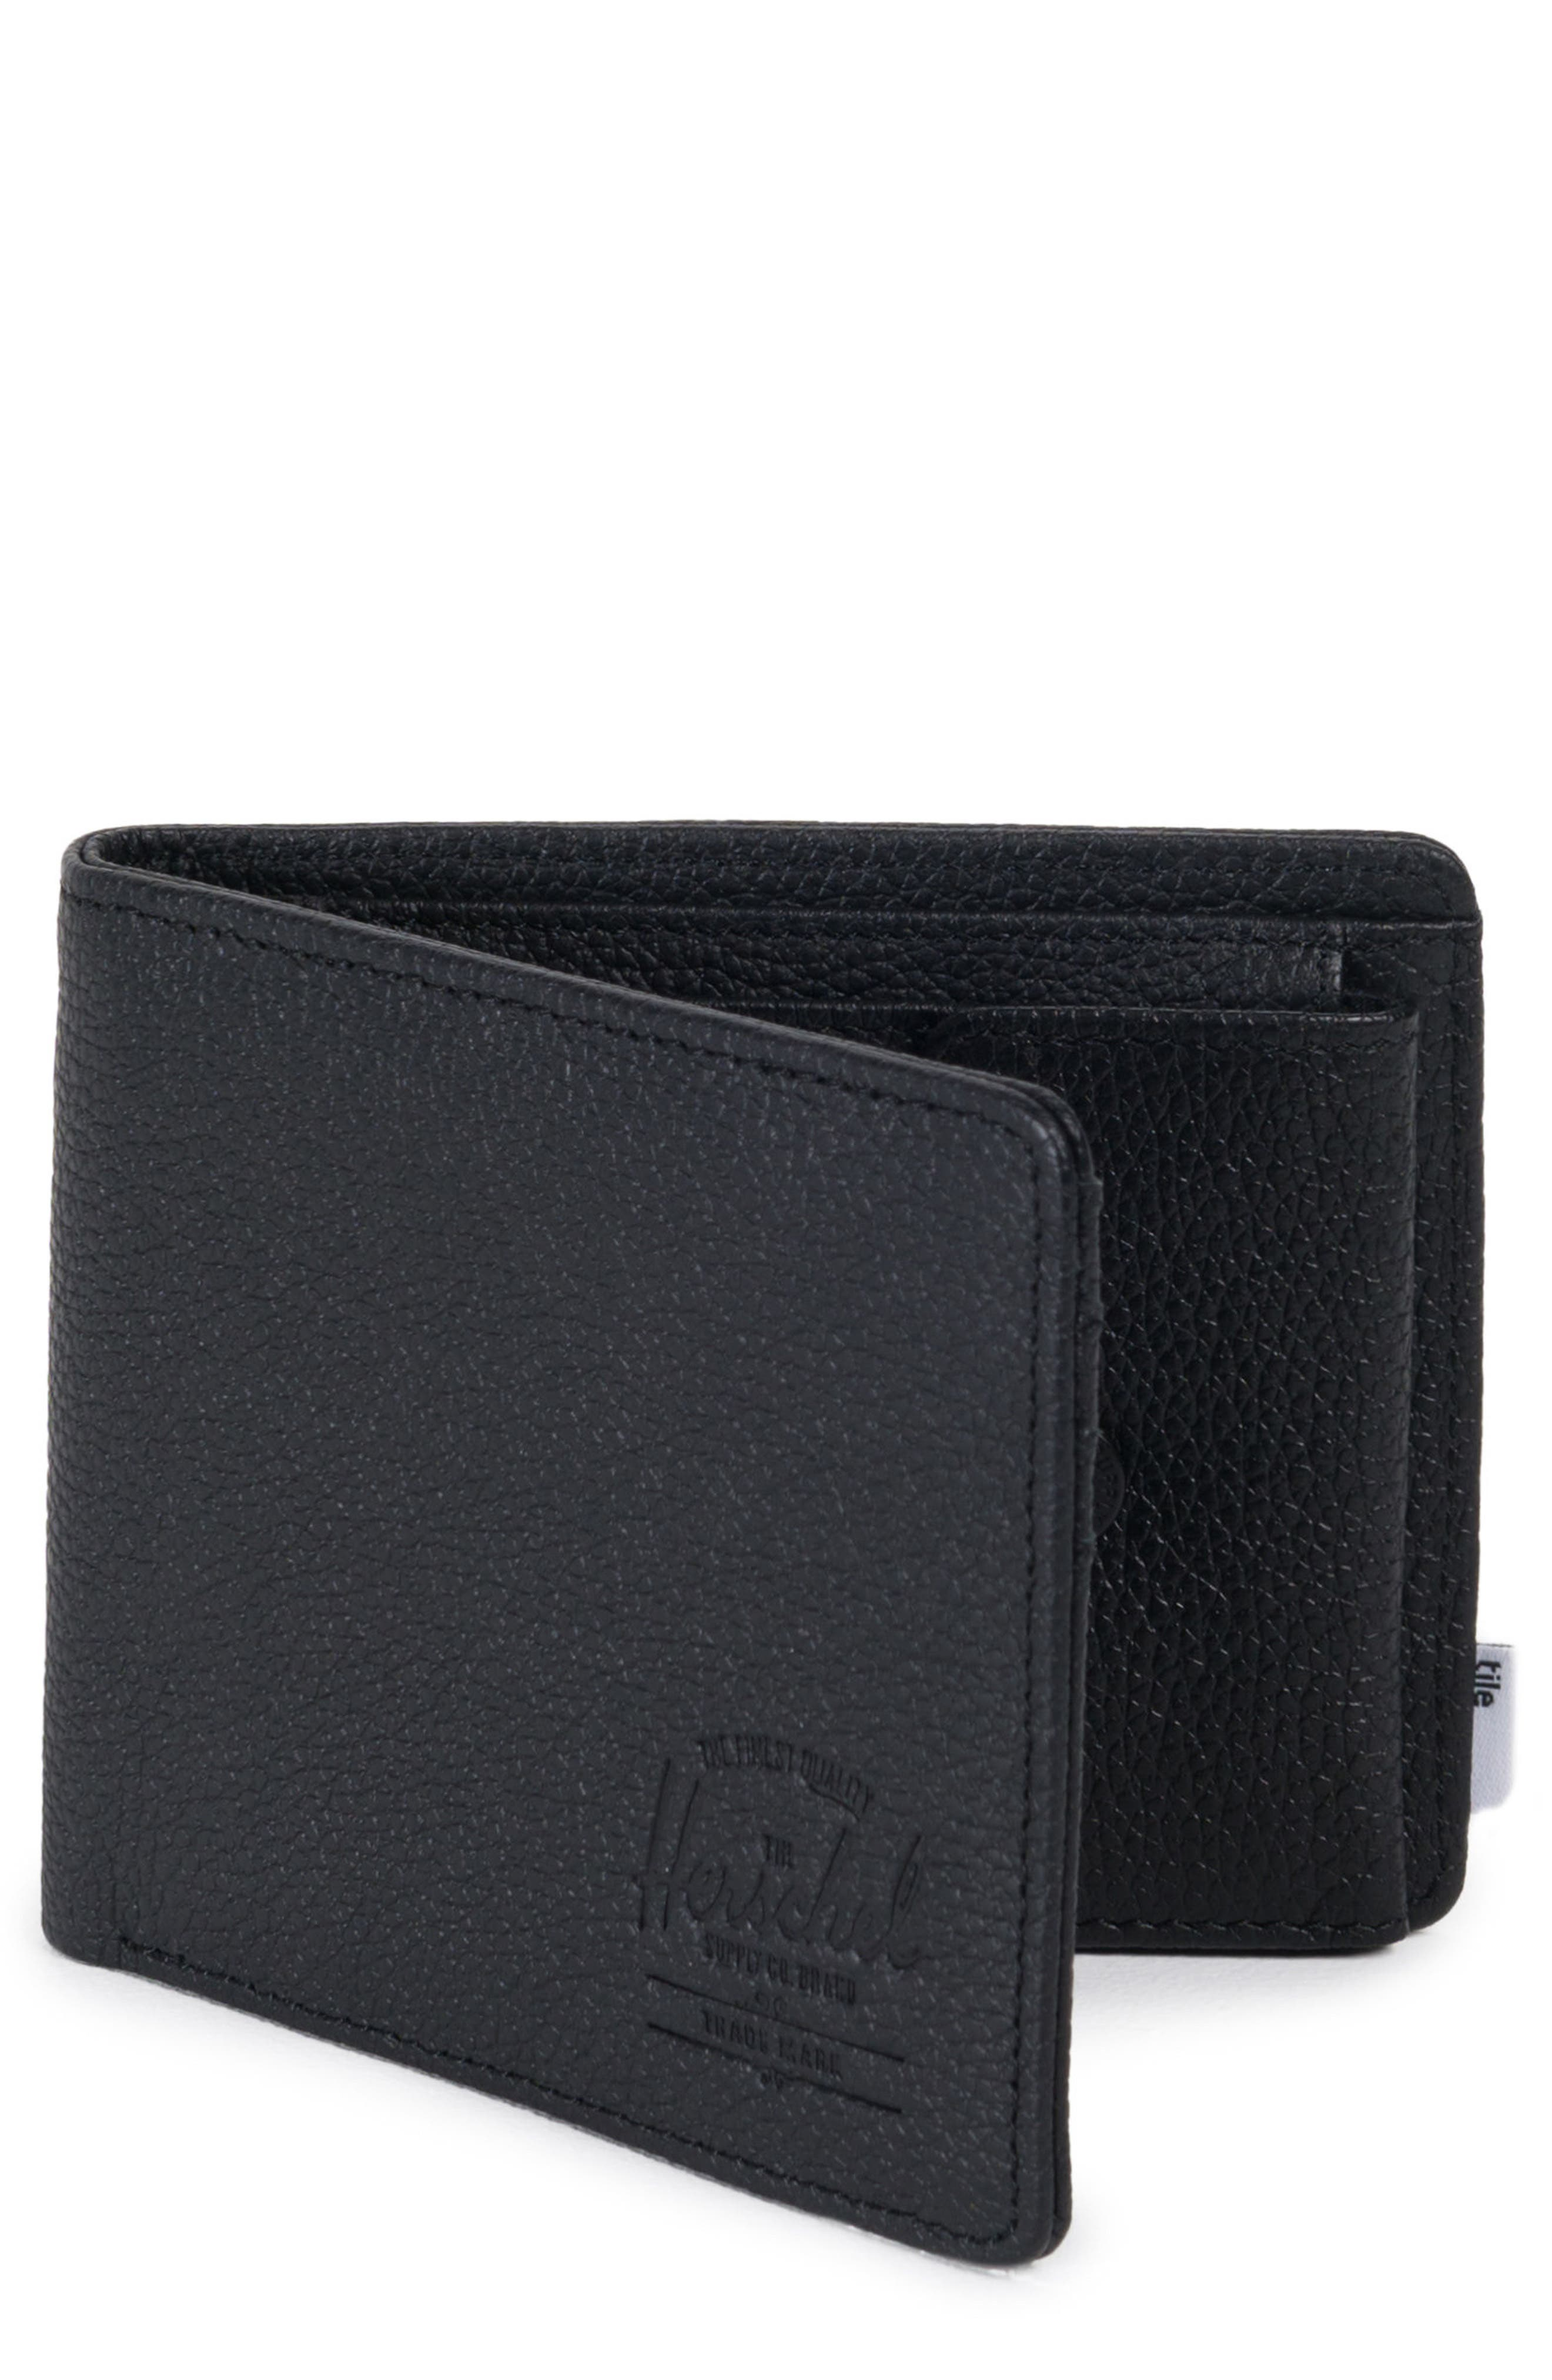 Tile Roy Leather Wallet,                         Main,                         color,